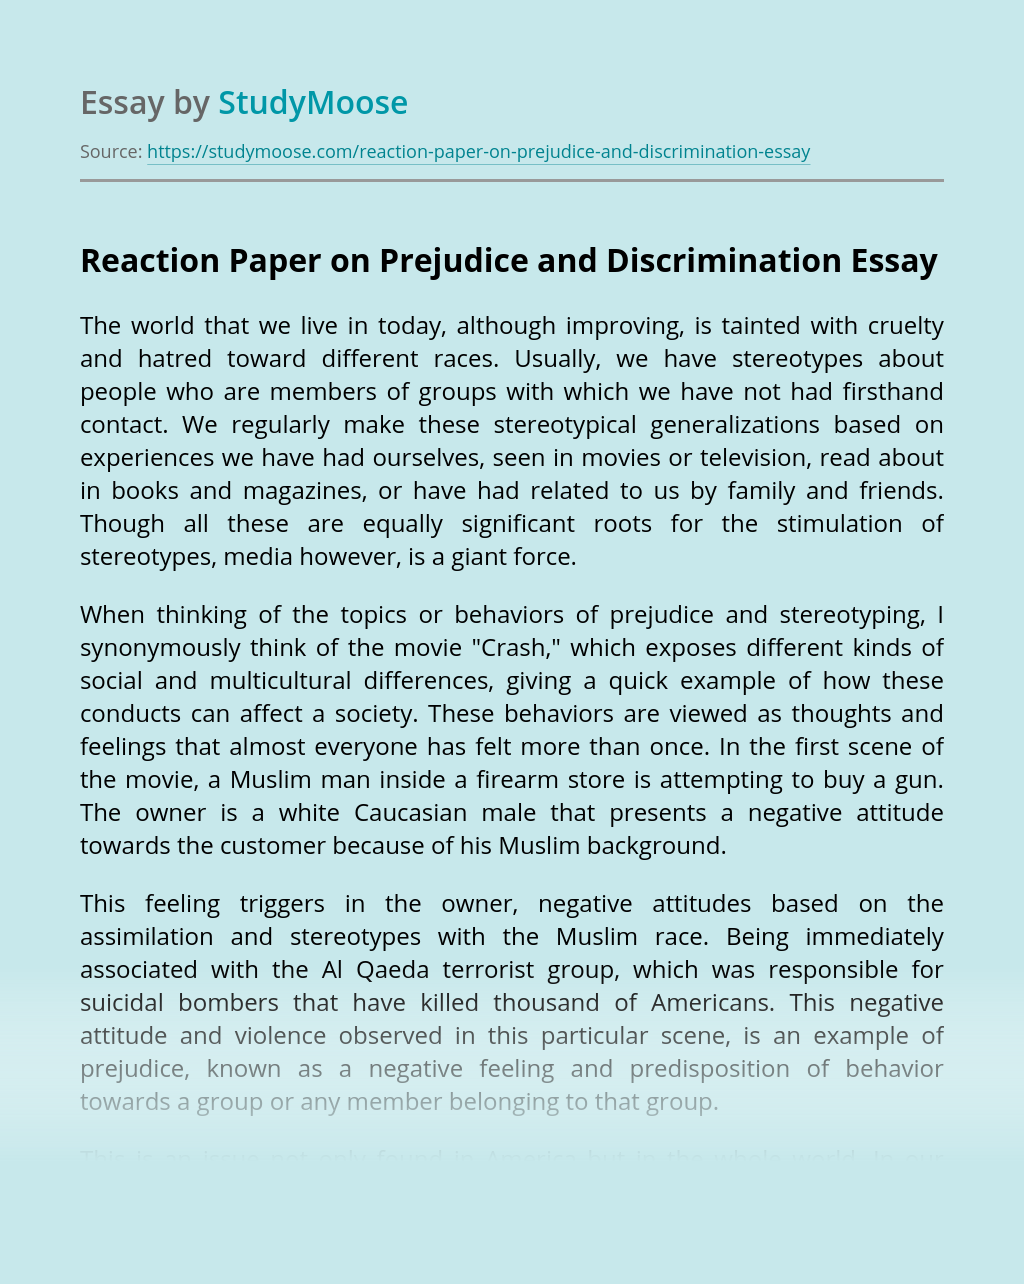 Reaction Paper on Prejudice and Discrimination